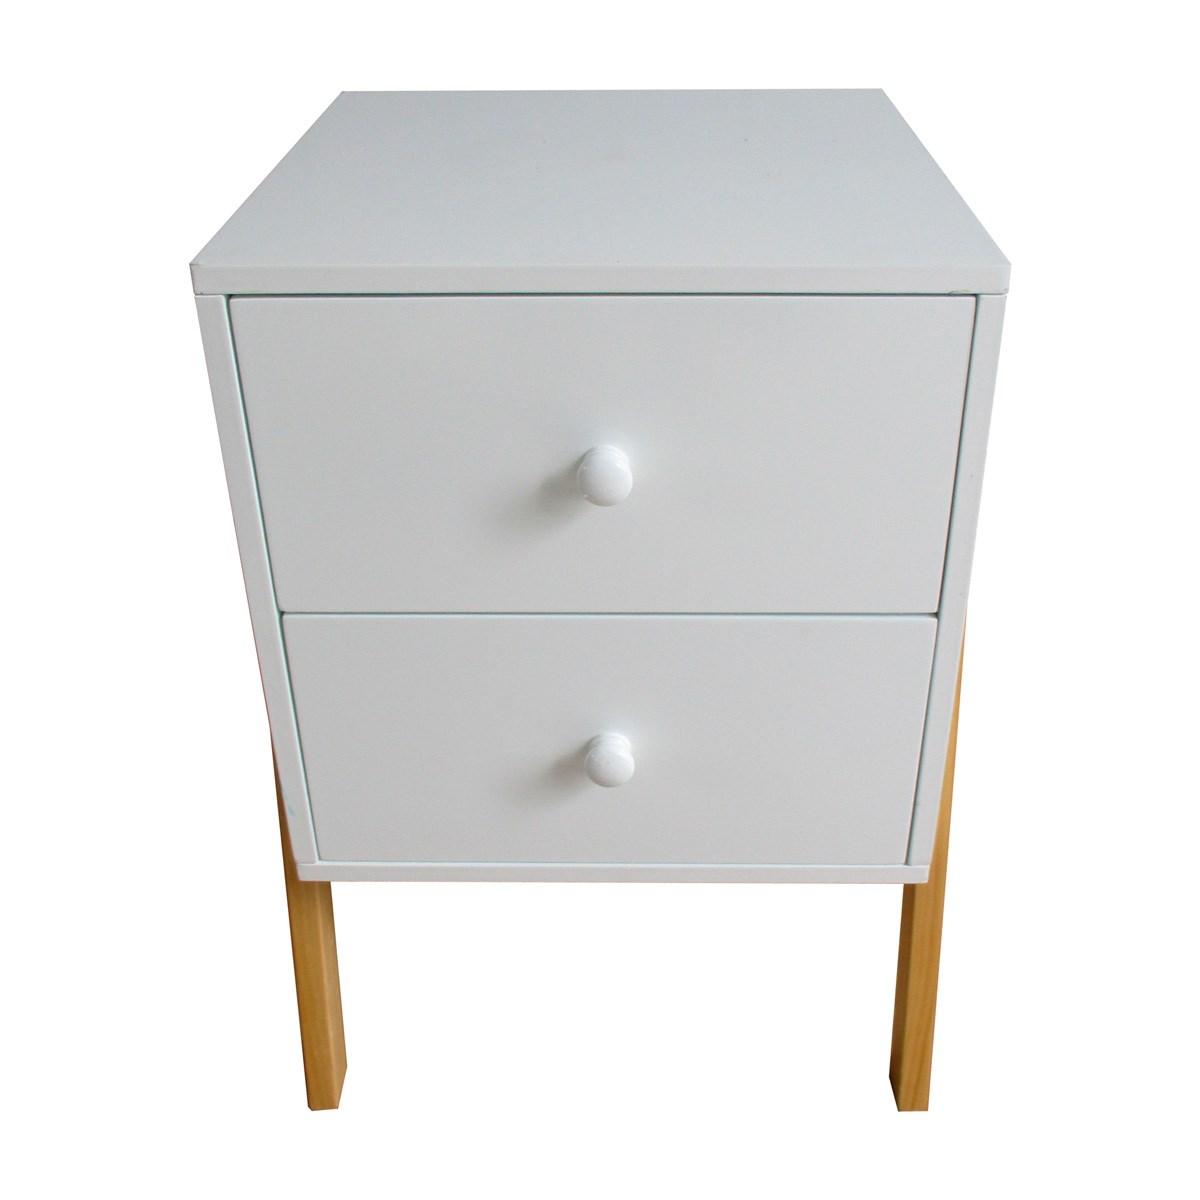 Retro Style Bedside Table Grey Or White Savvysurf Co Uk